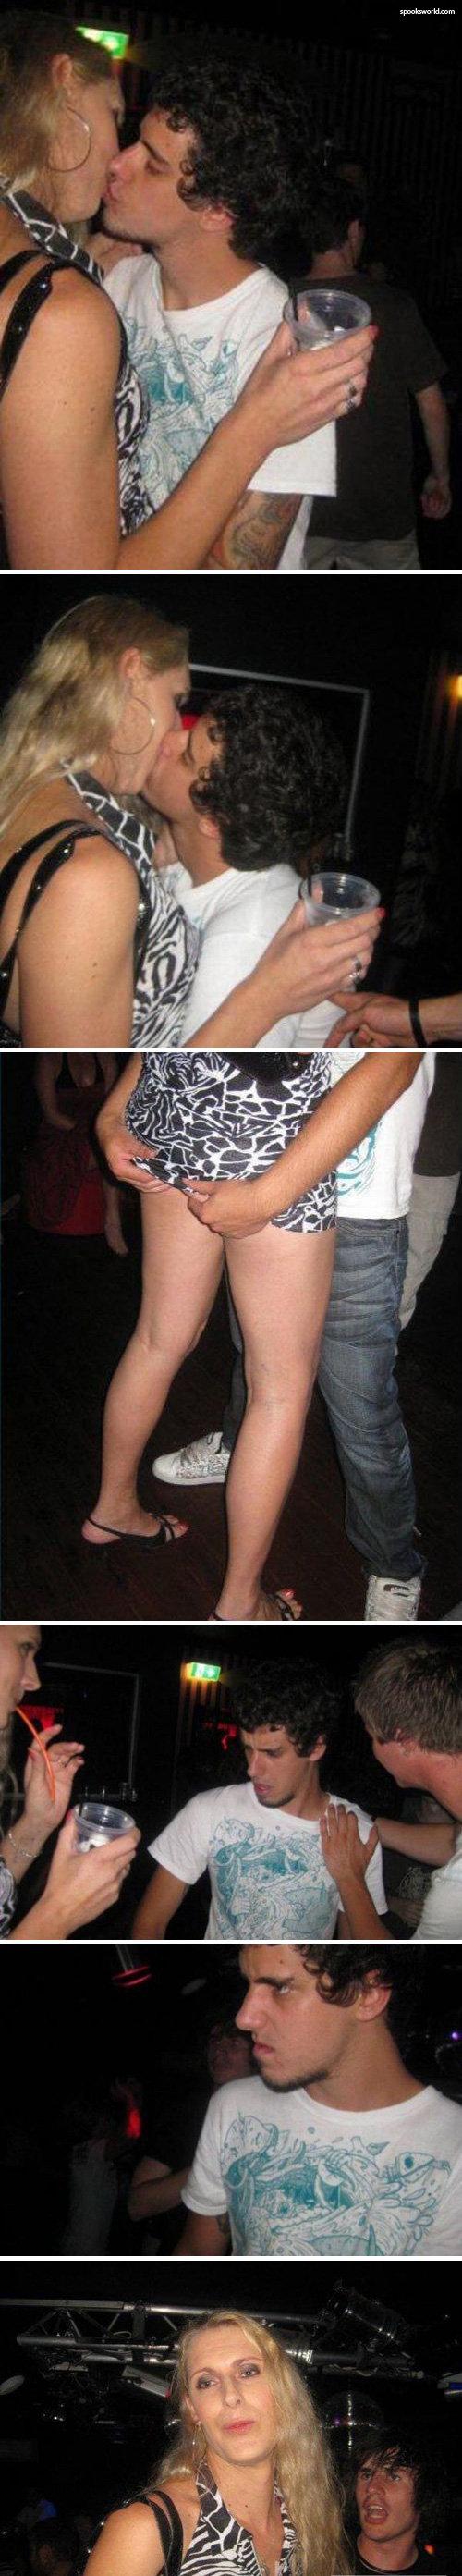 HOOKUP IN THE CLUB. Wrong gender lol.. Oopssssssss nightclub tranny cross dresser gay man